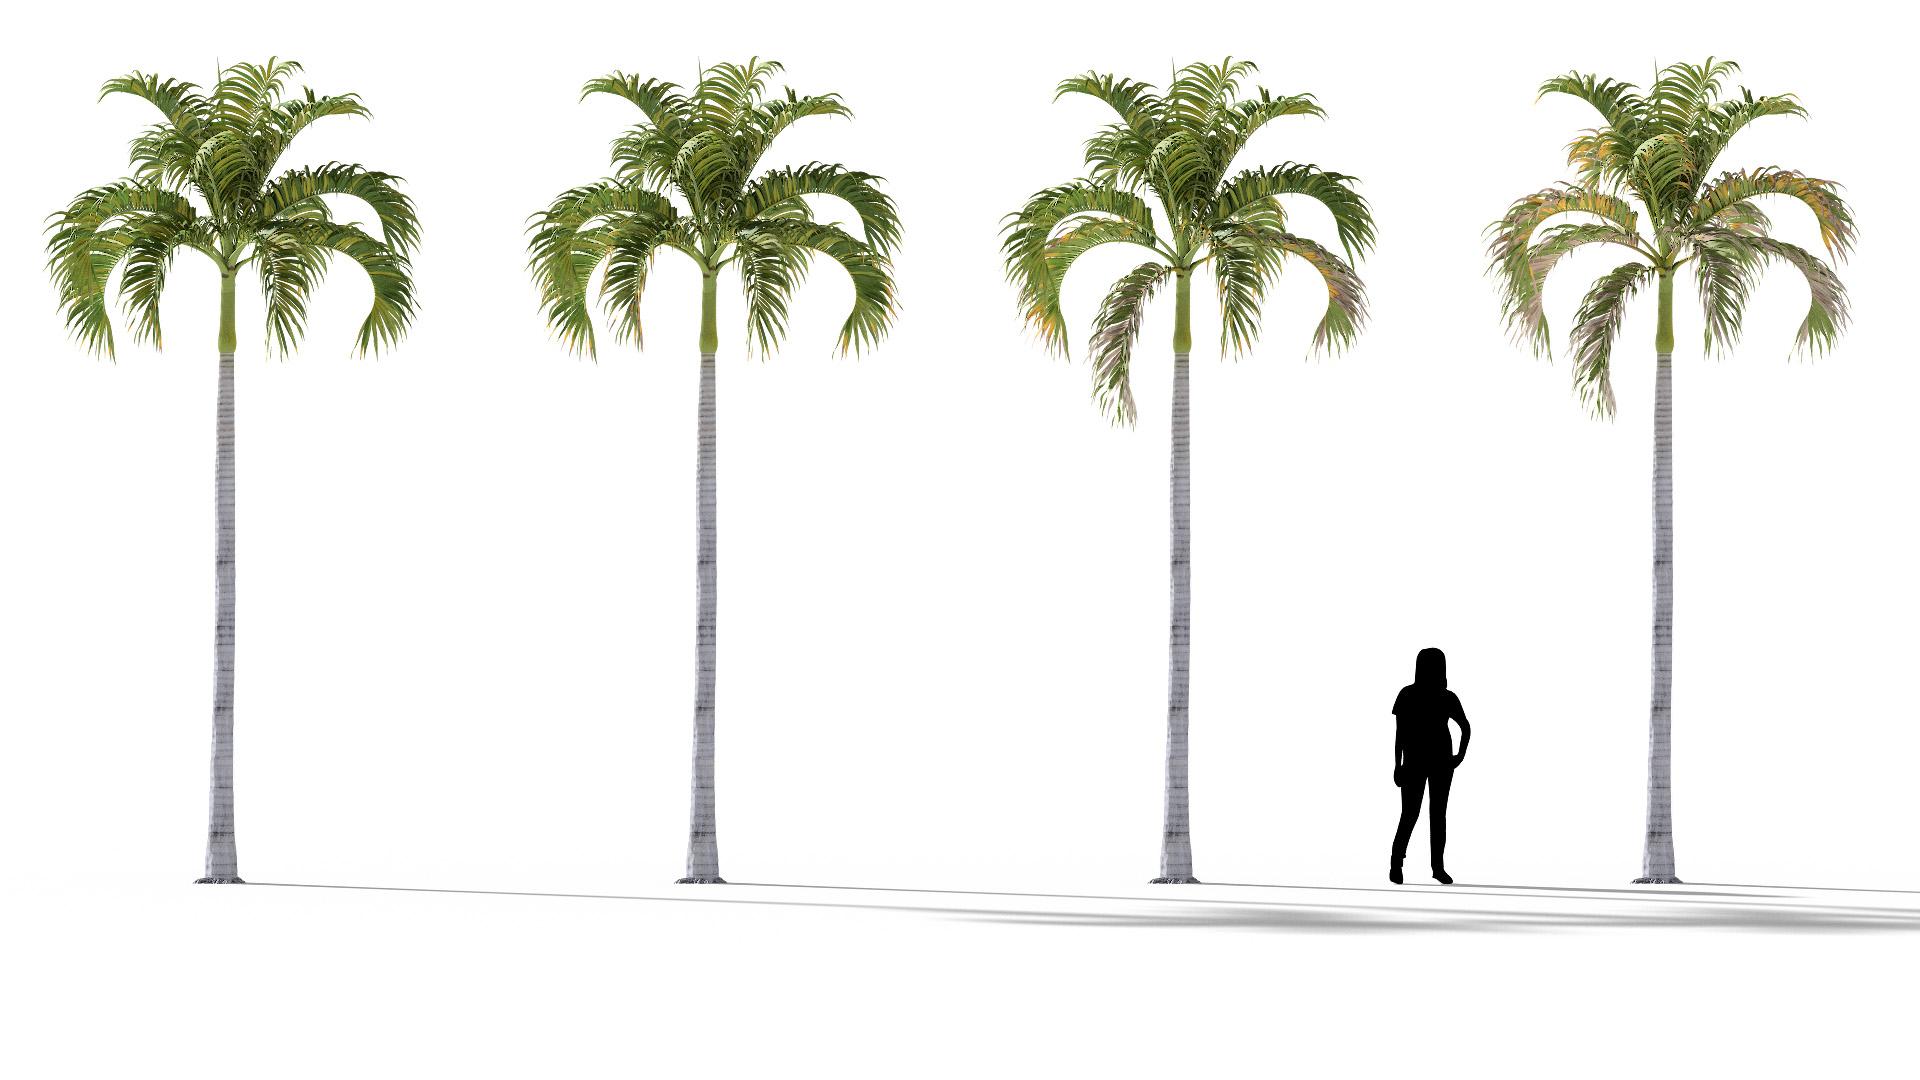 3D model of the Christmas palm Adonidia merrillii health variations